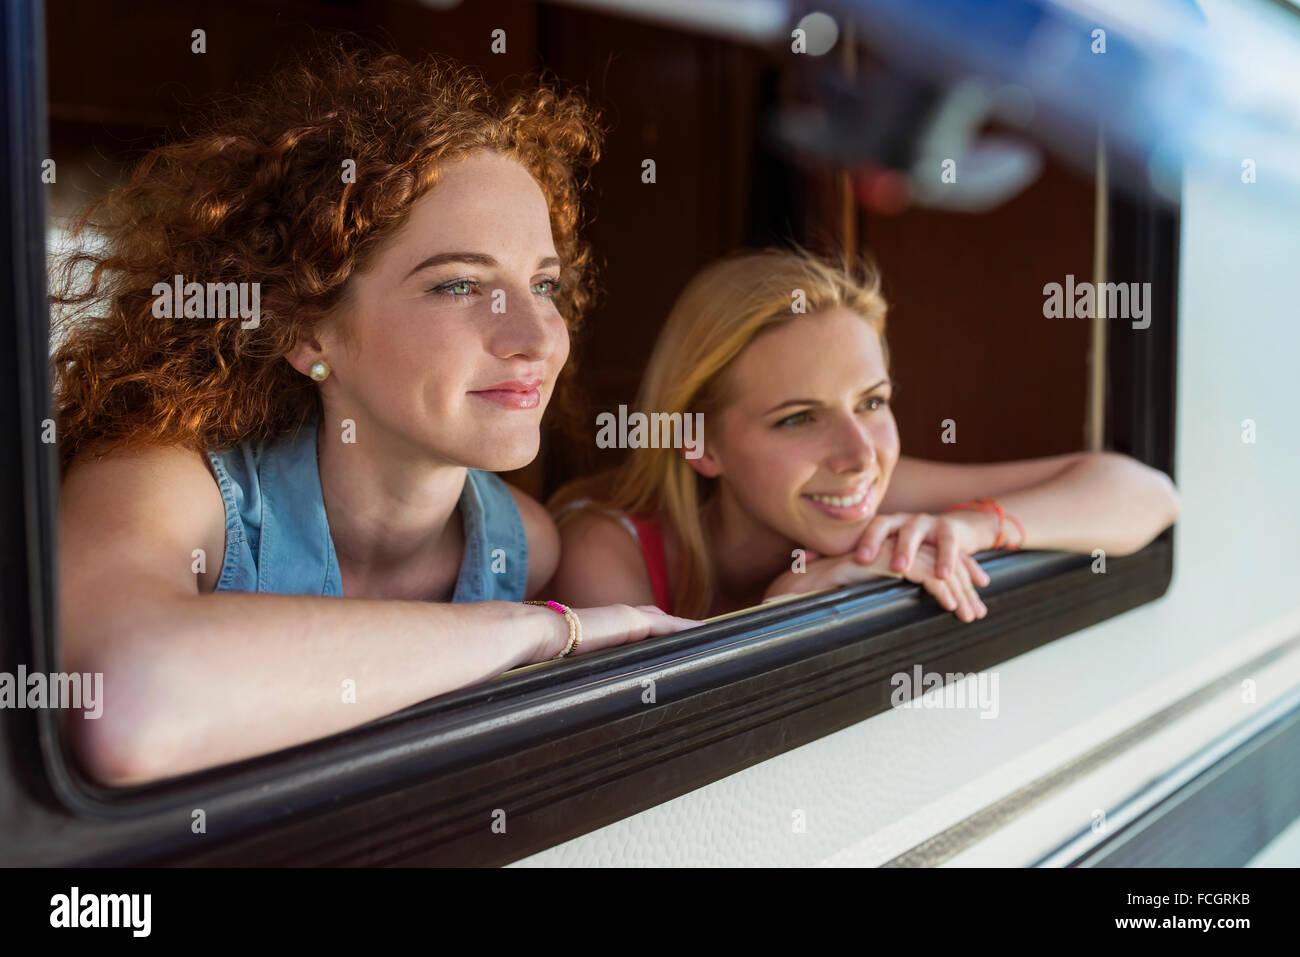 Two female friends looking through window of caravan watching something - Stock Image